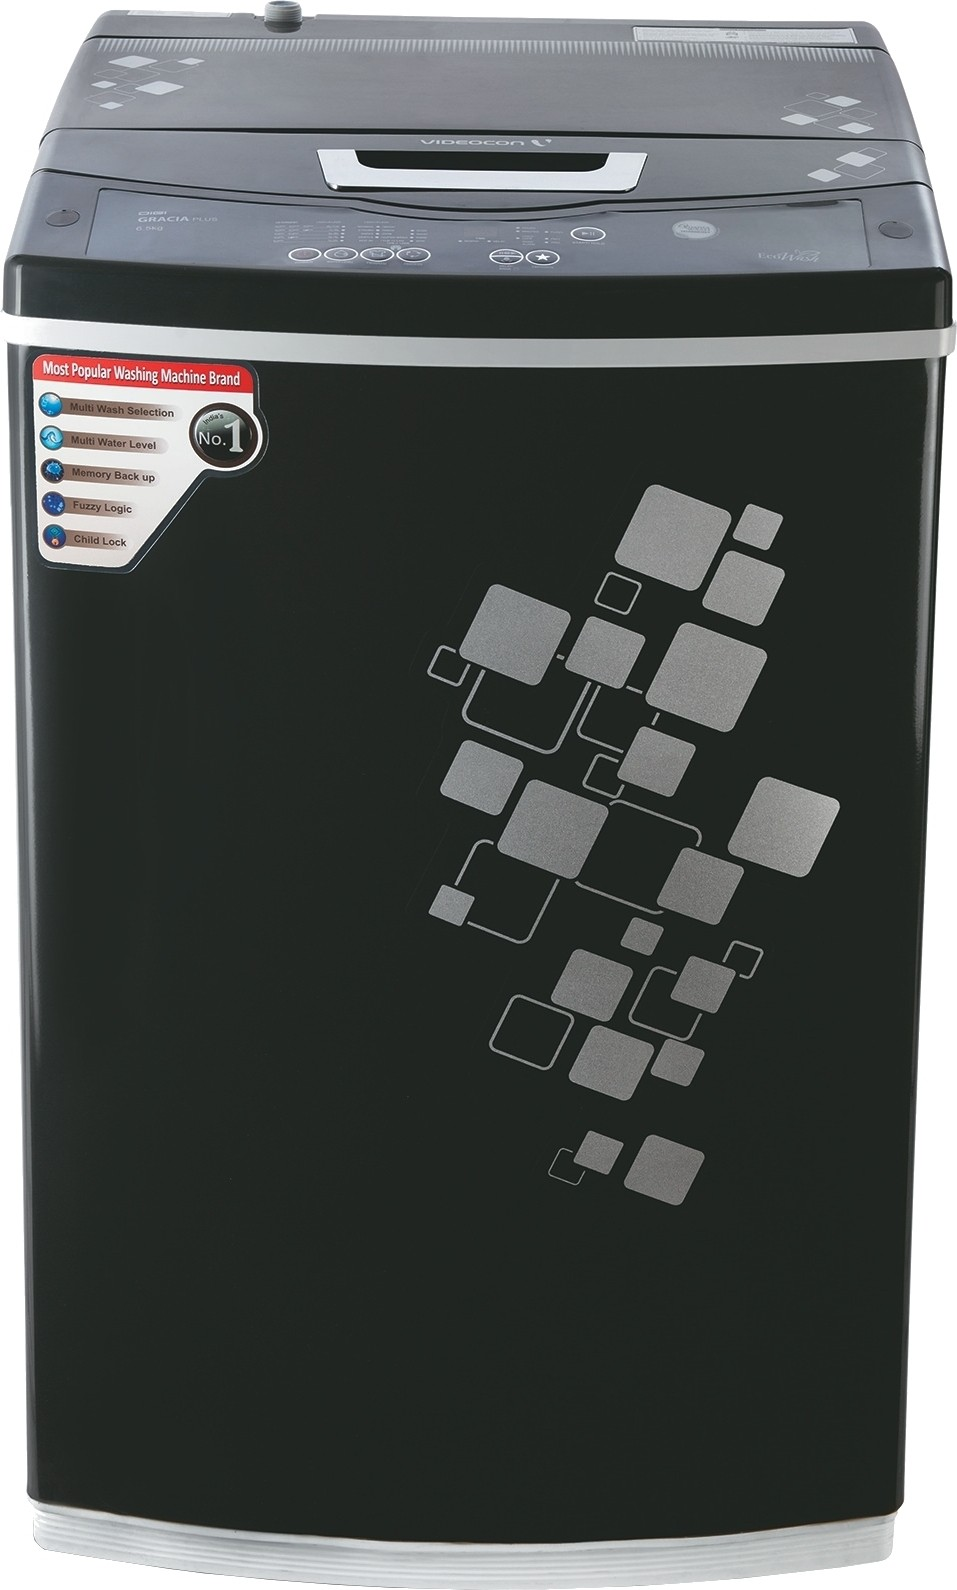 Videocon Digi Gracia Prime WM VT60H12-RG 6 kg Fully Automatic Top Loading Washing Machine